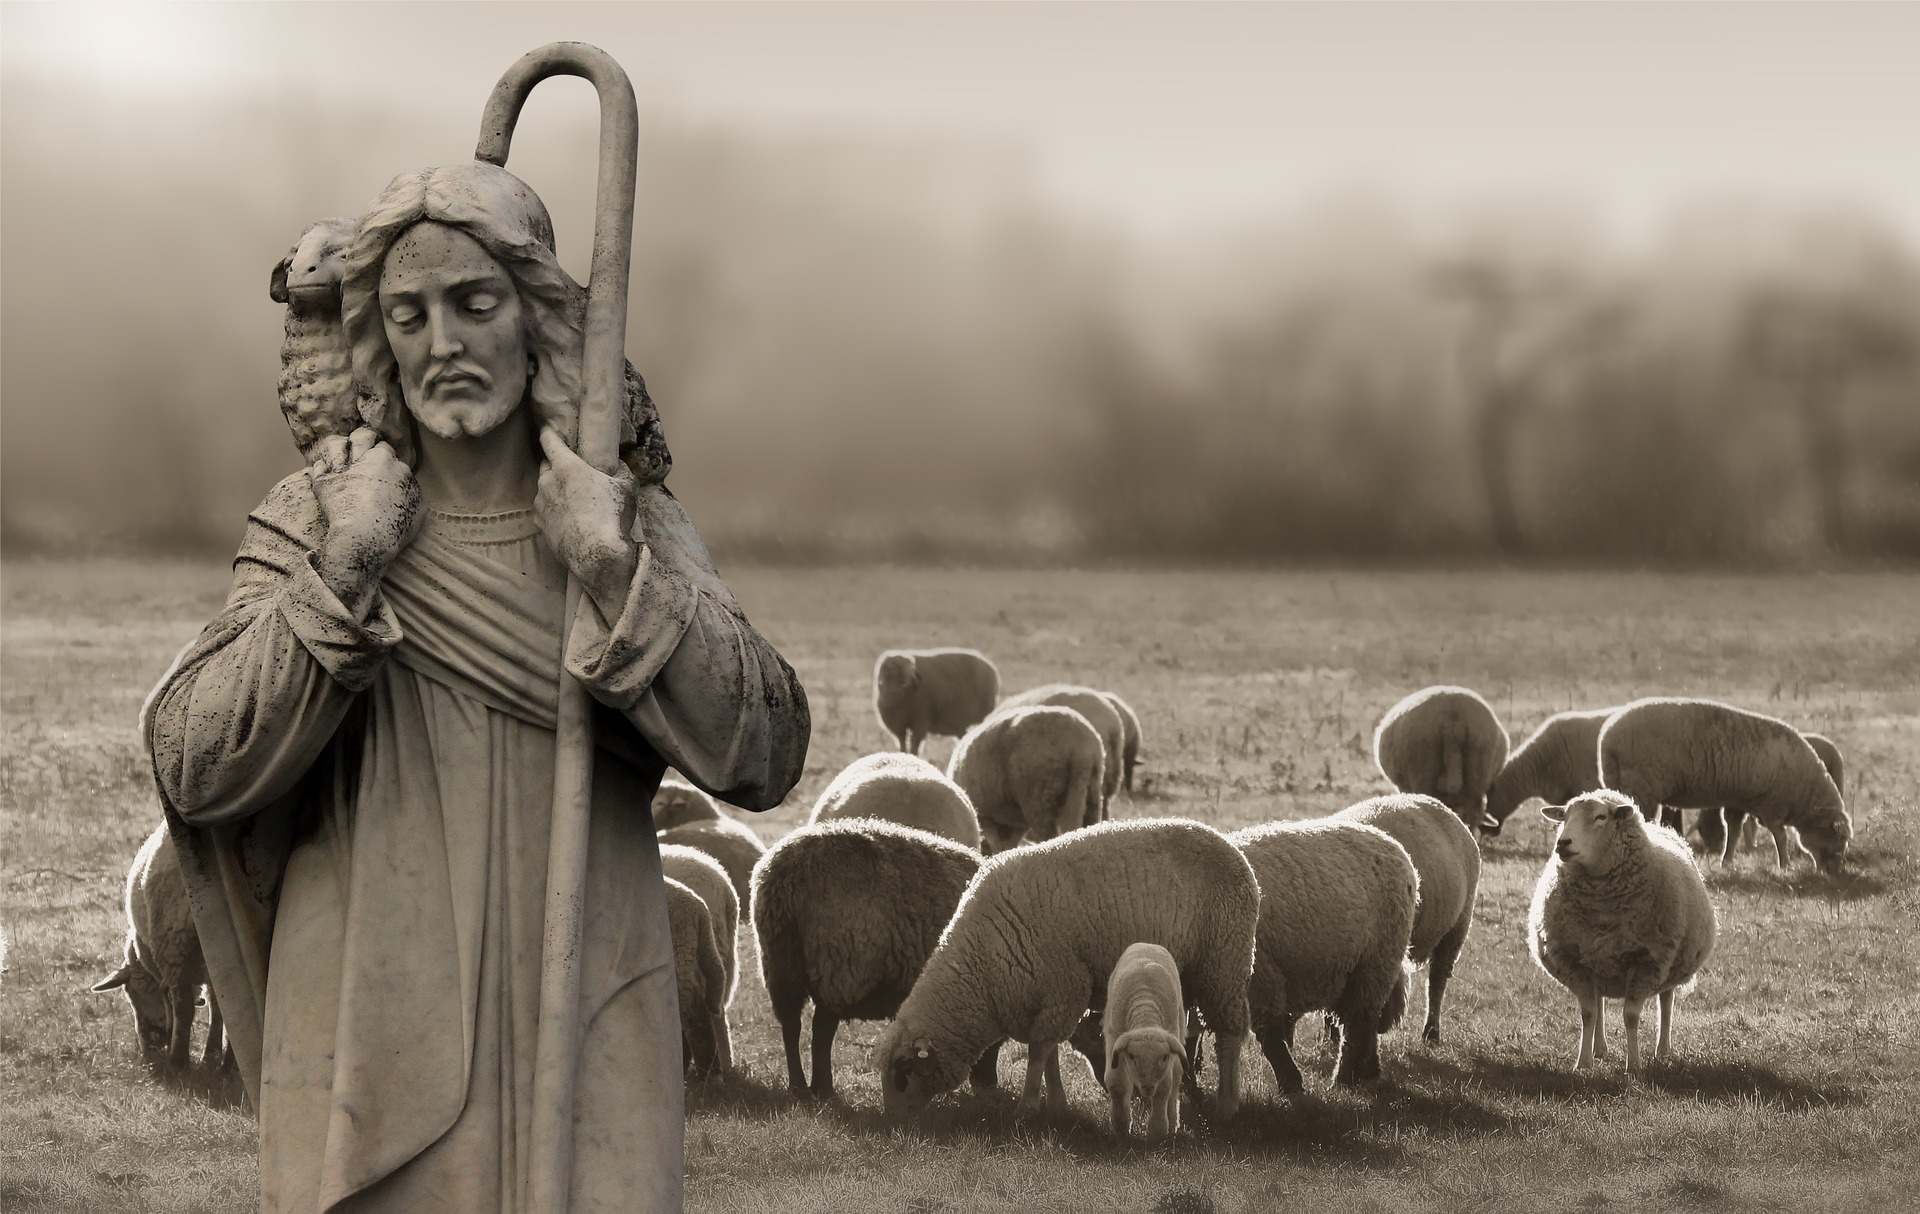 what religion was Jesus